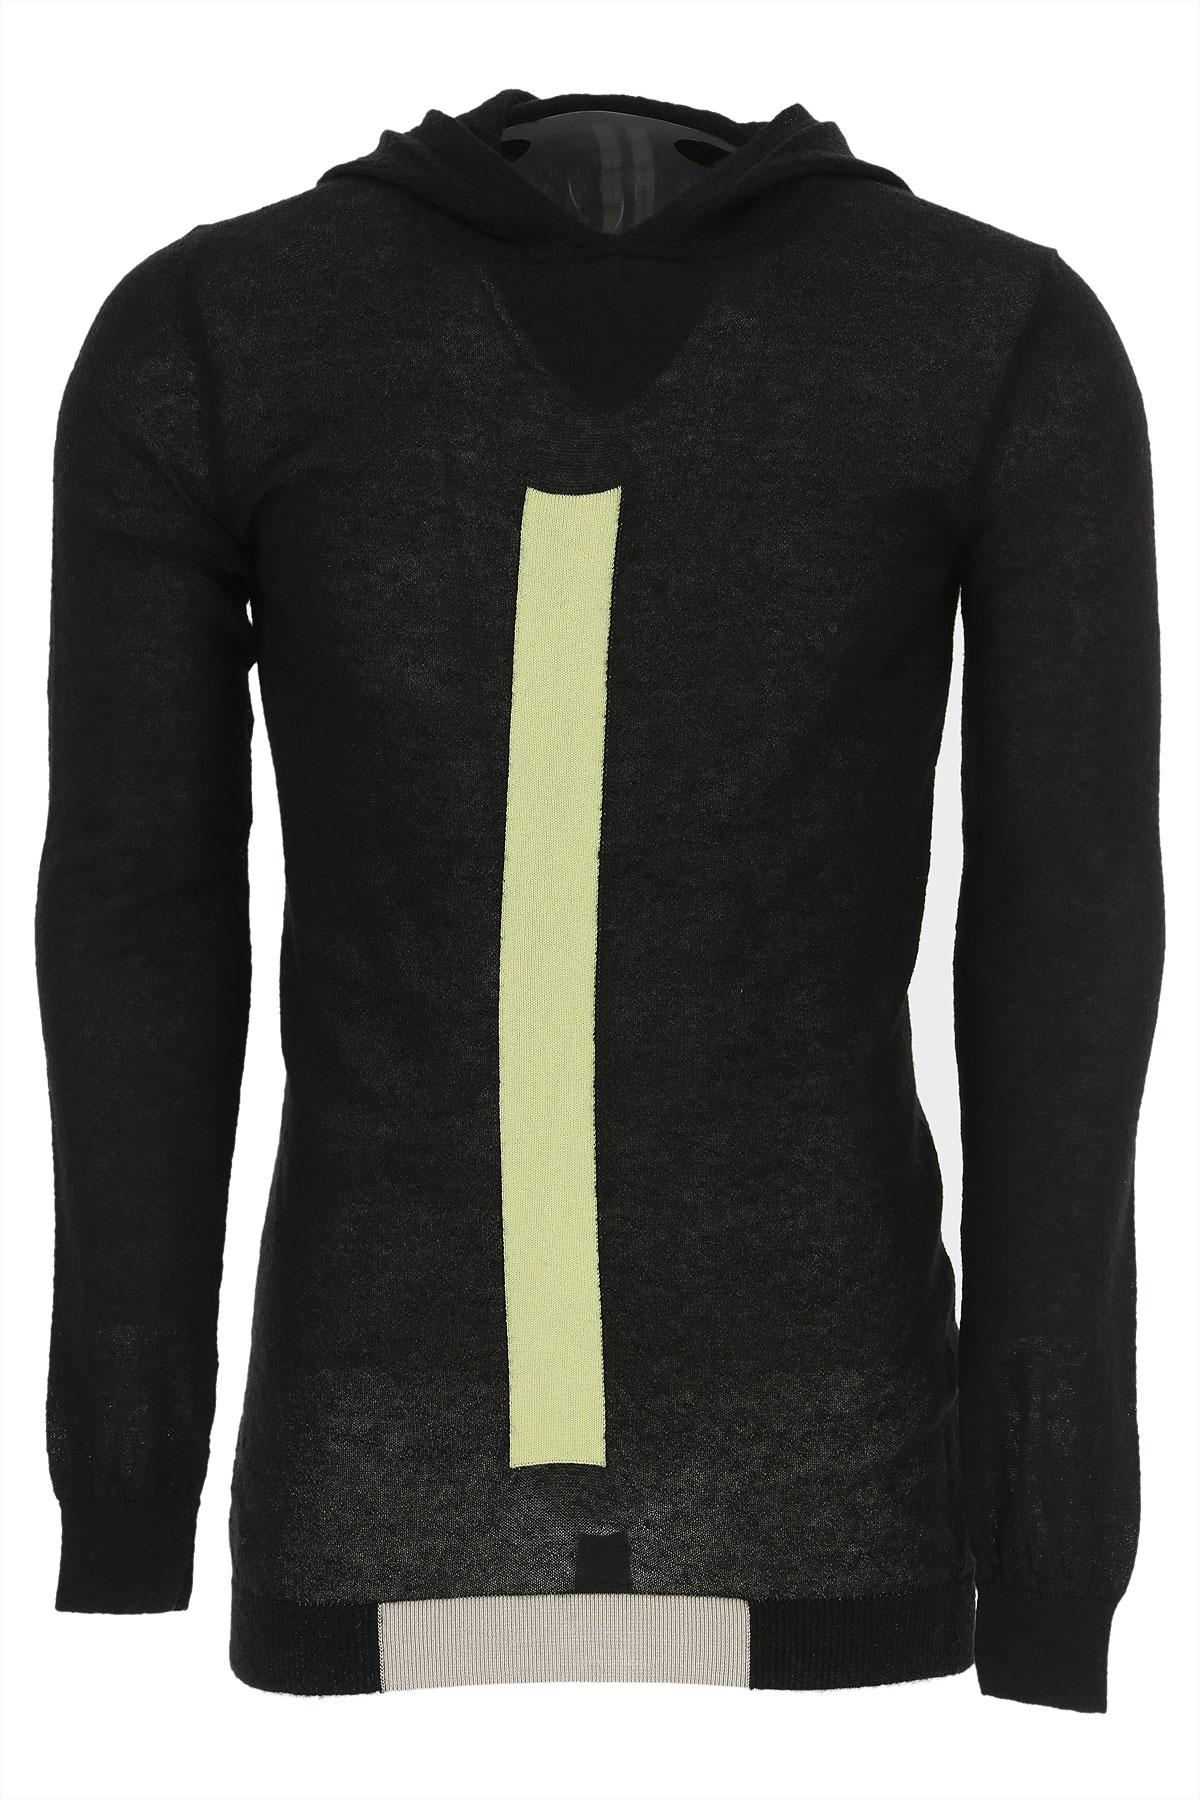 Rick Owens Sweater for Men Jumper On Sale in Outlet, Black, Baby Alpaca, 2019, L M S